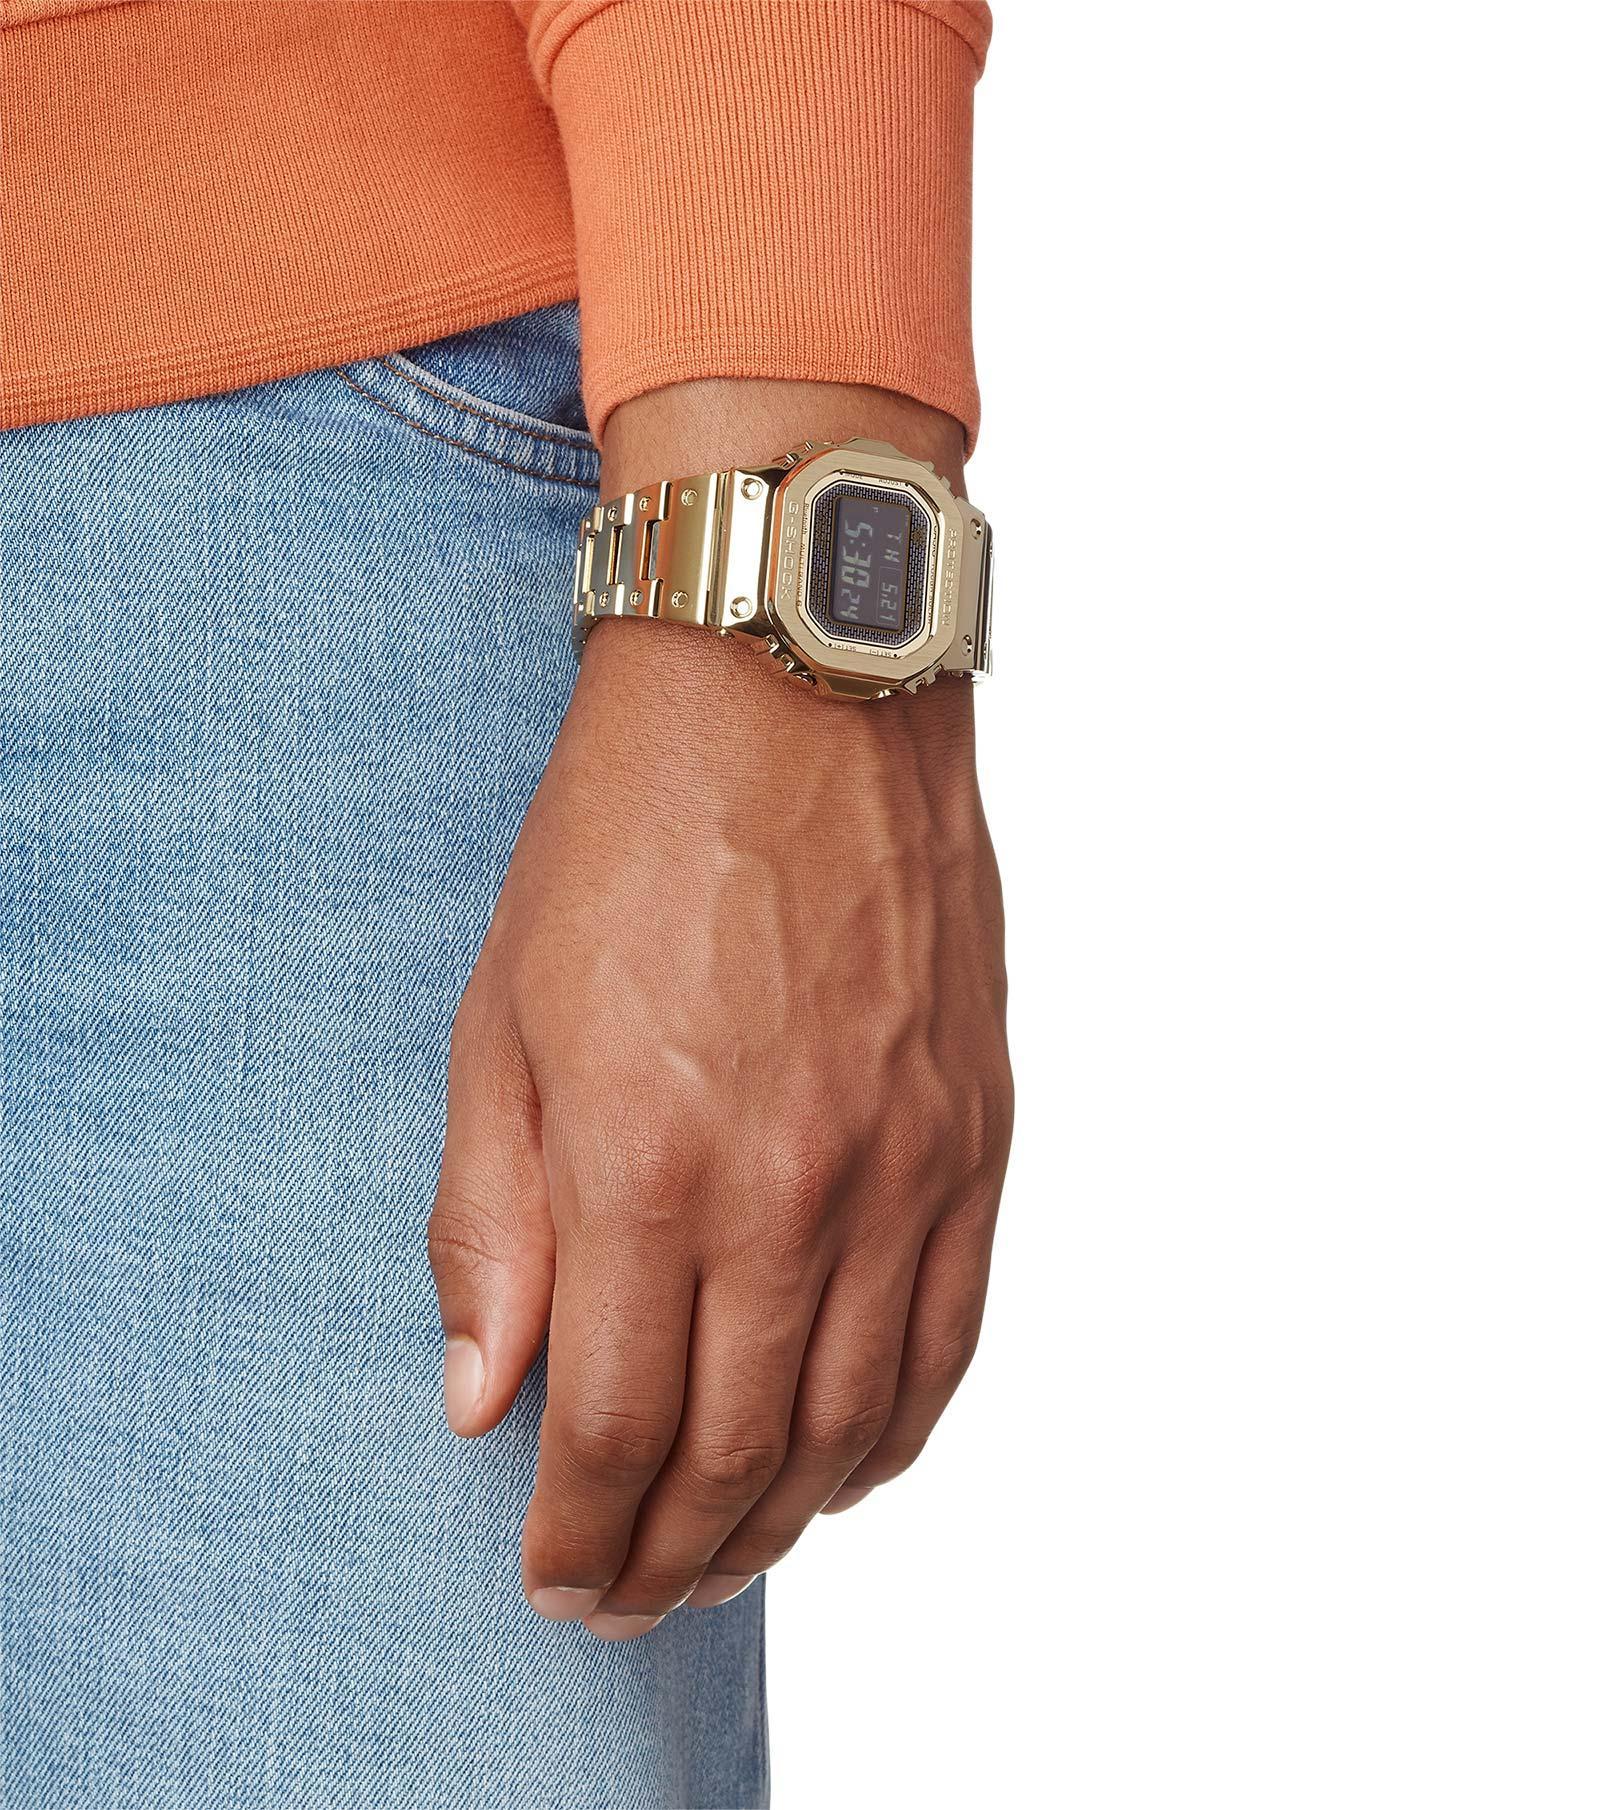 G-Shock GMW-B5000GD-9ER zegarek męski G-SHOCK Specials